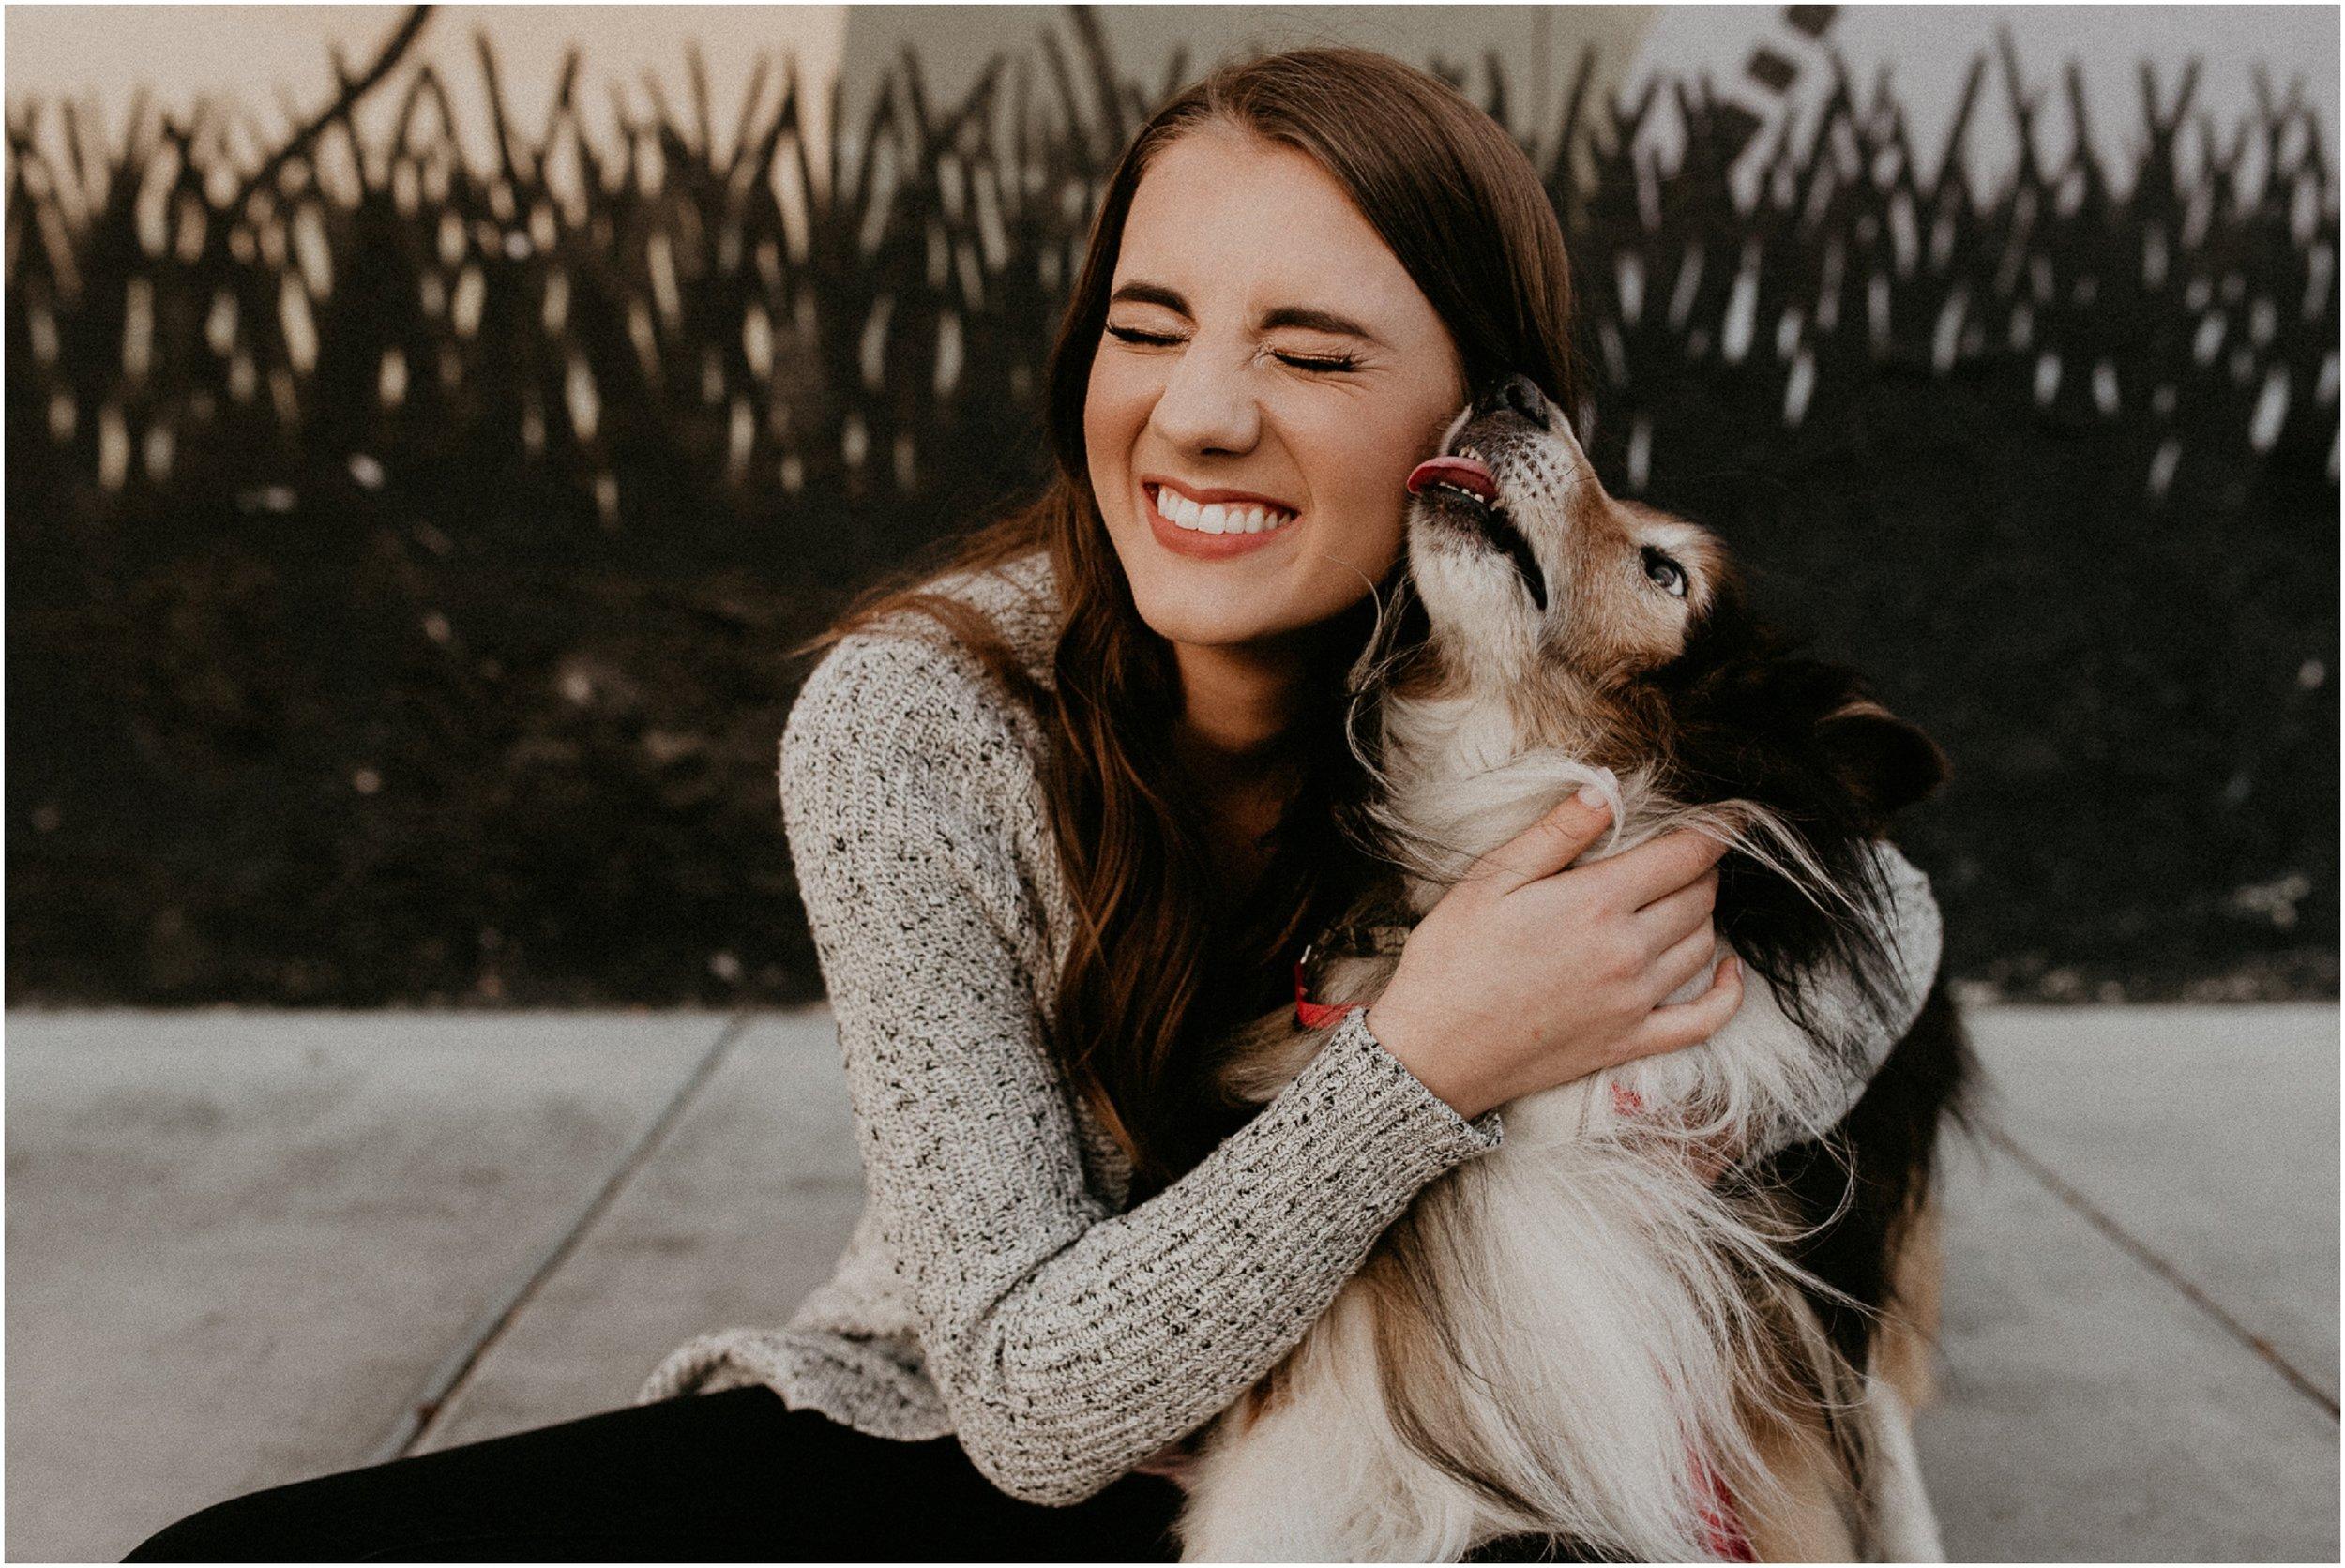 Boise Senior Photographer Makayla Madden Photography Senior Girl Dog Puppy Downtown Boise Record Exchange